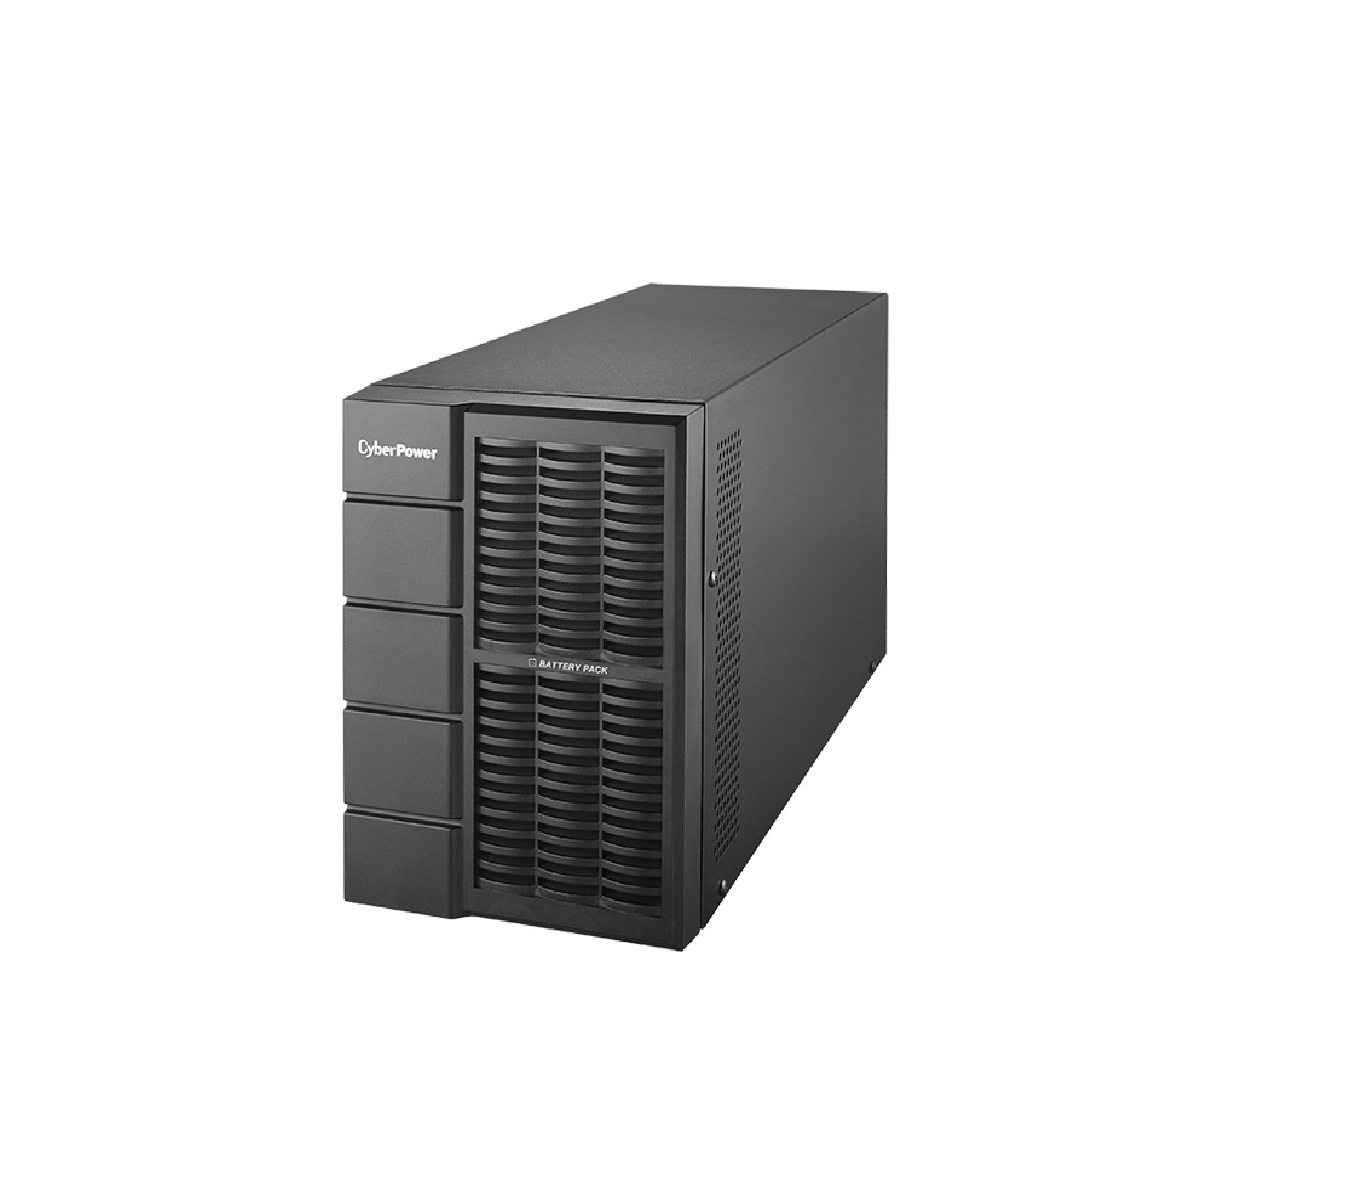 Bộ nguồn ắc quy CyberPower BPSE72V45A